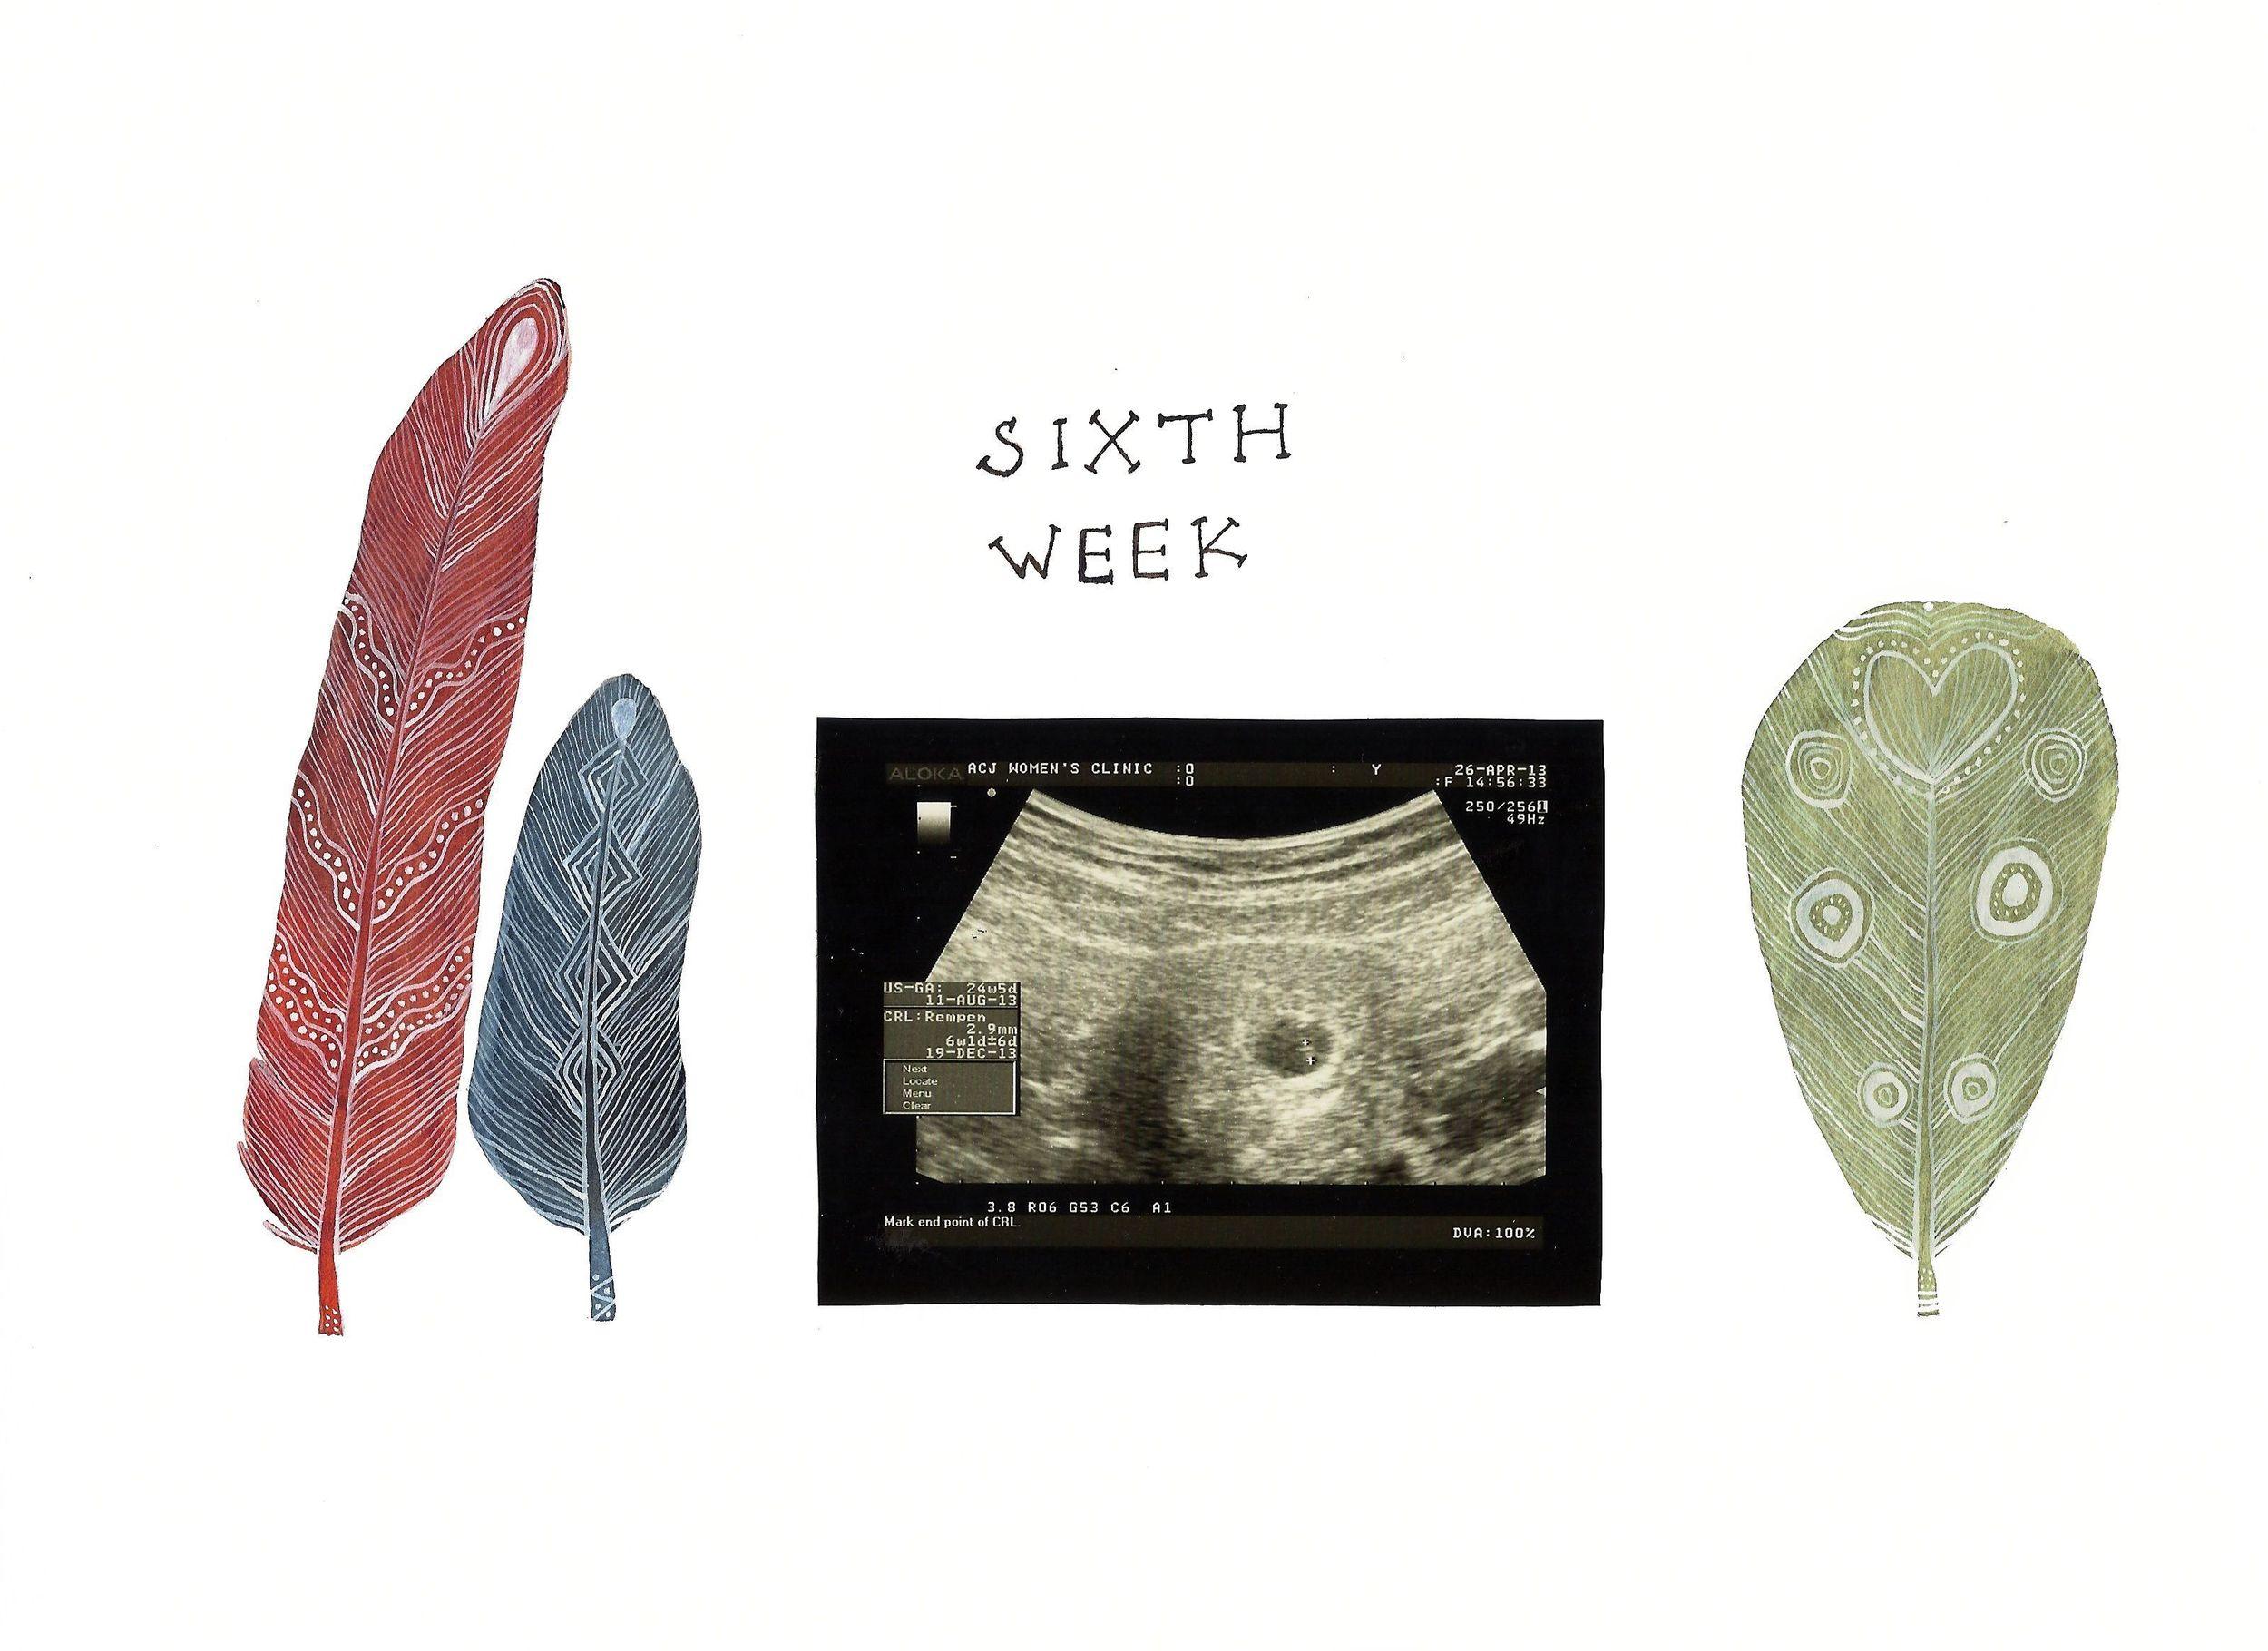 sixth week ultrasound scan